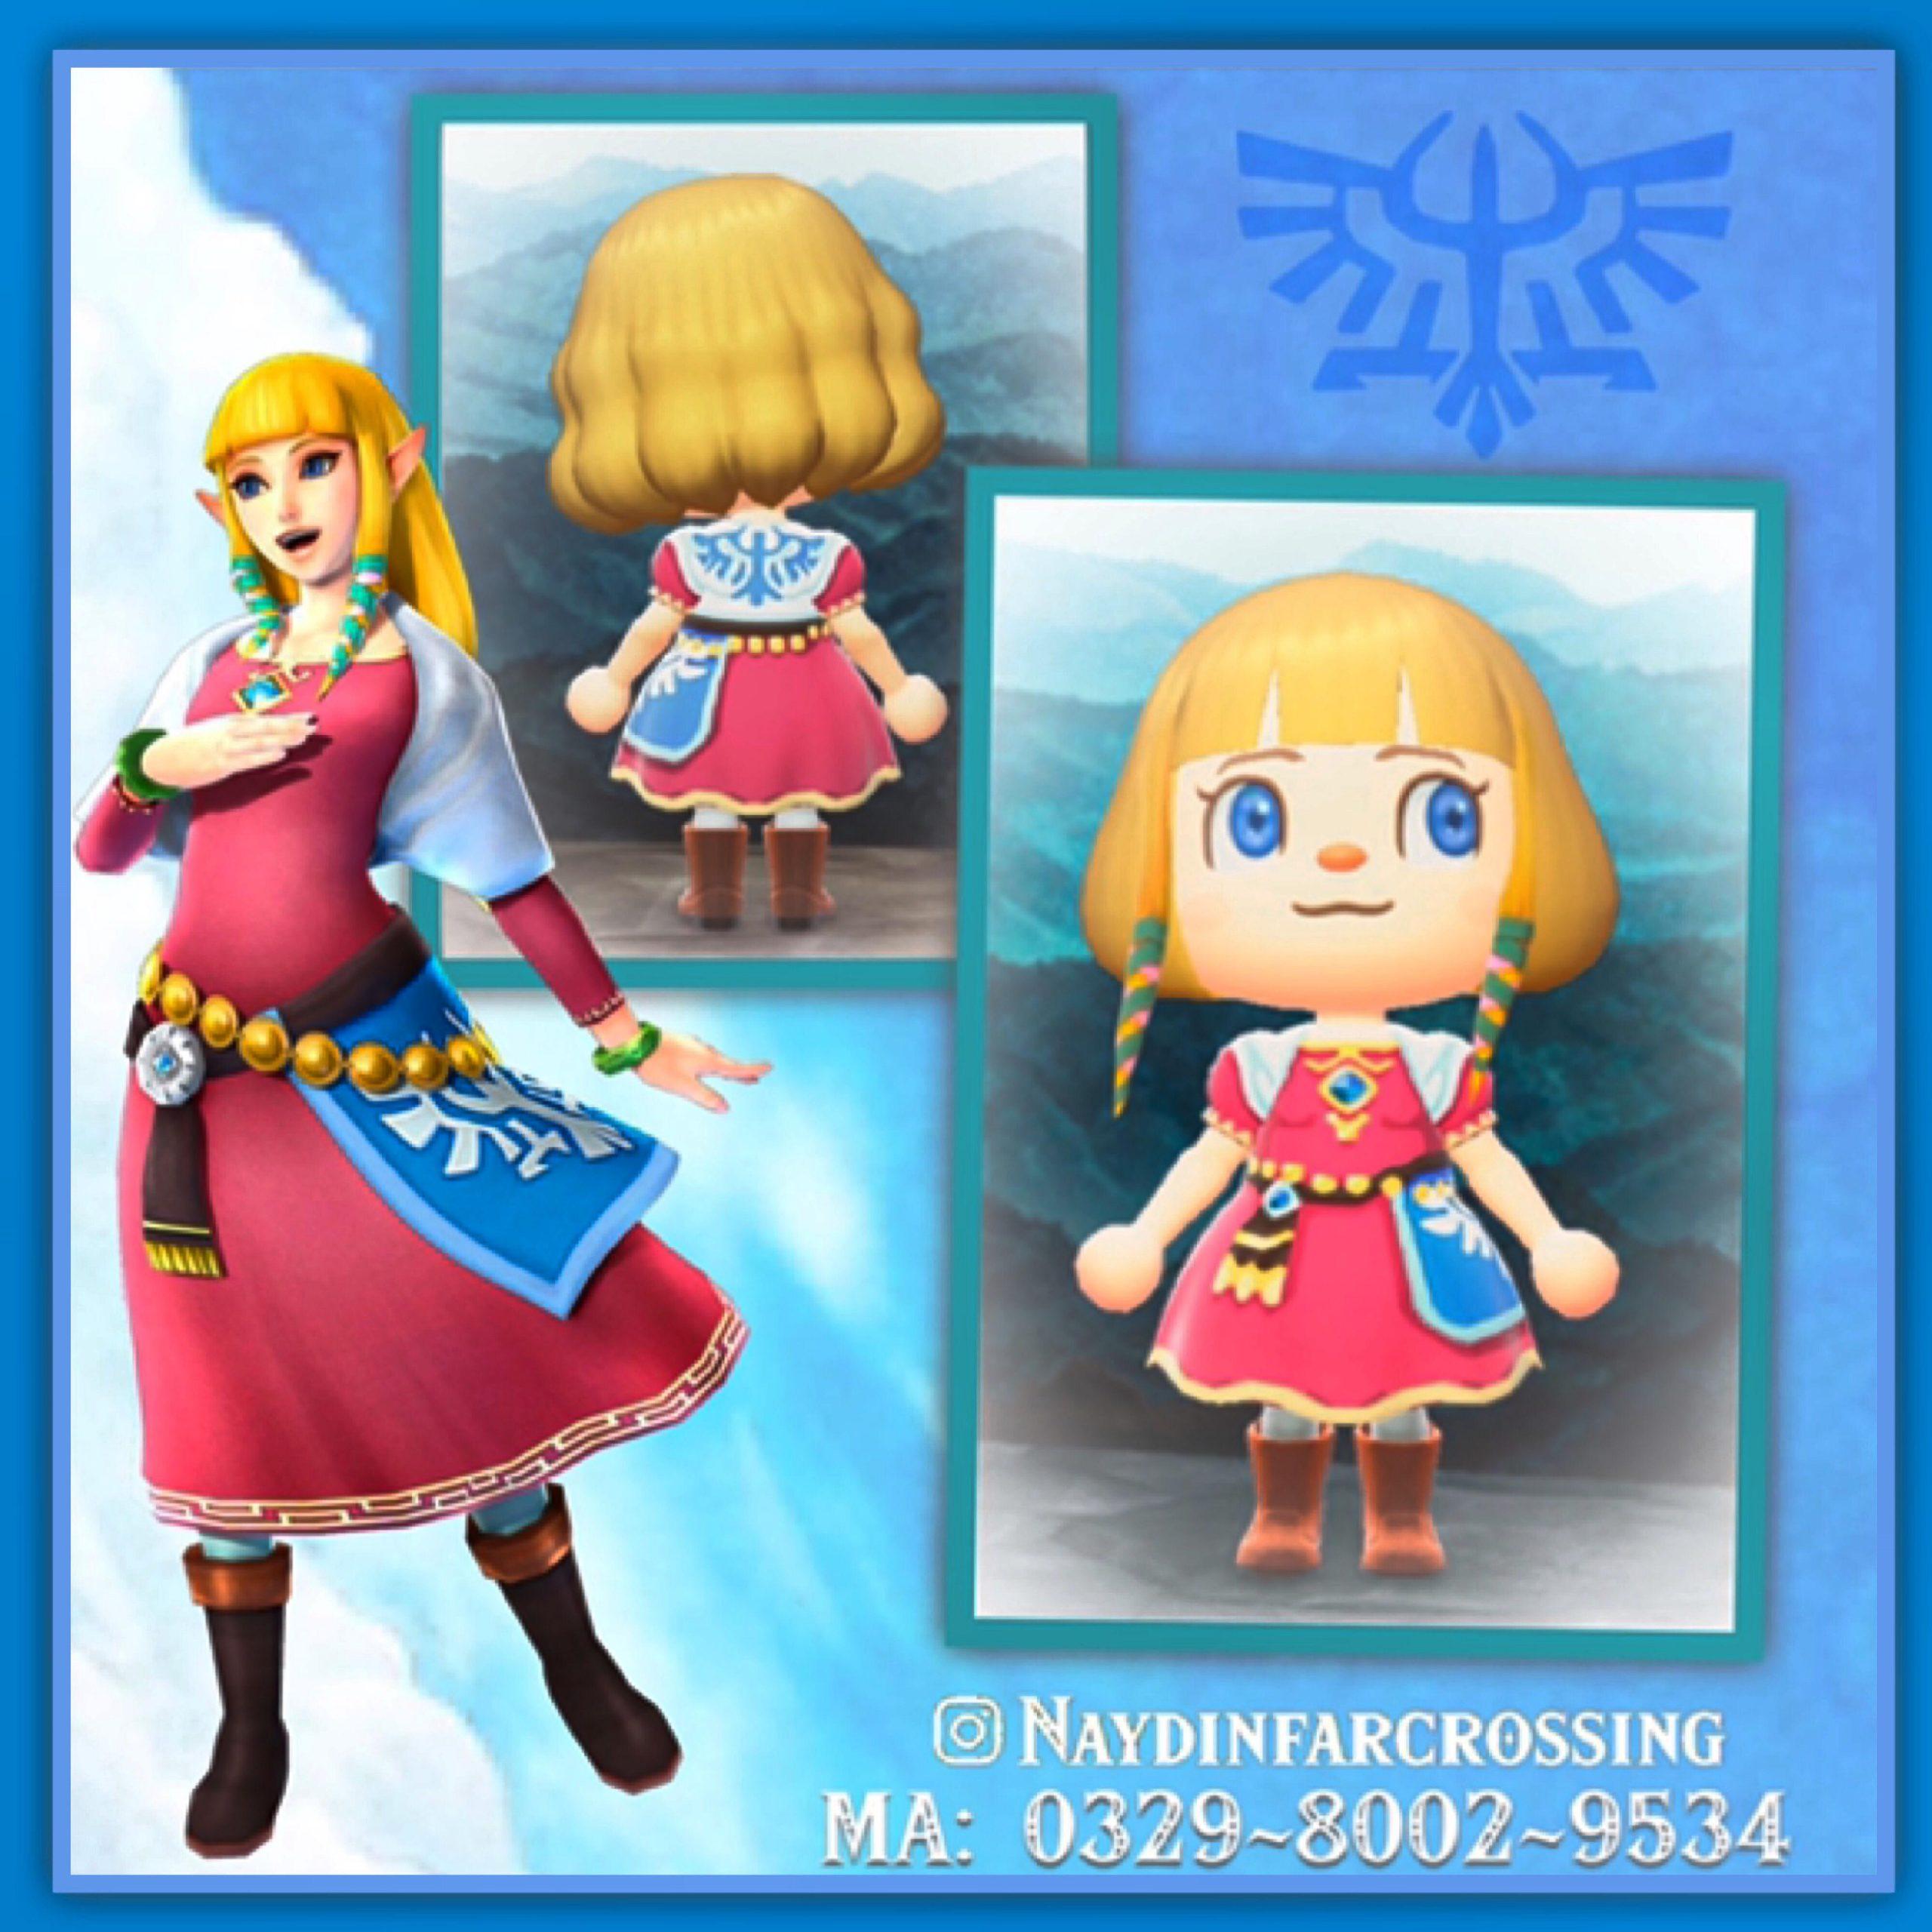 Zelda-Skyward Sword ~in all tones.....hair/eyes edited for fun